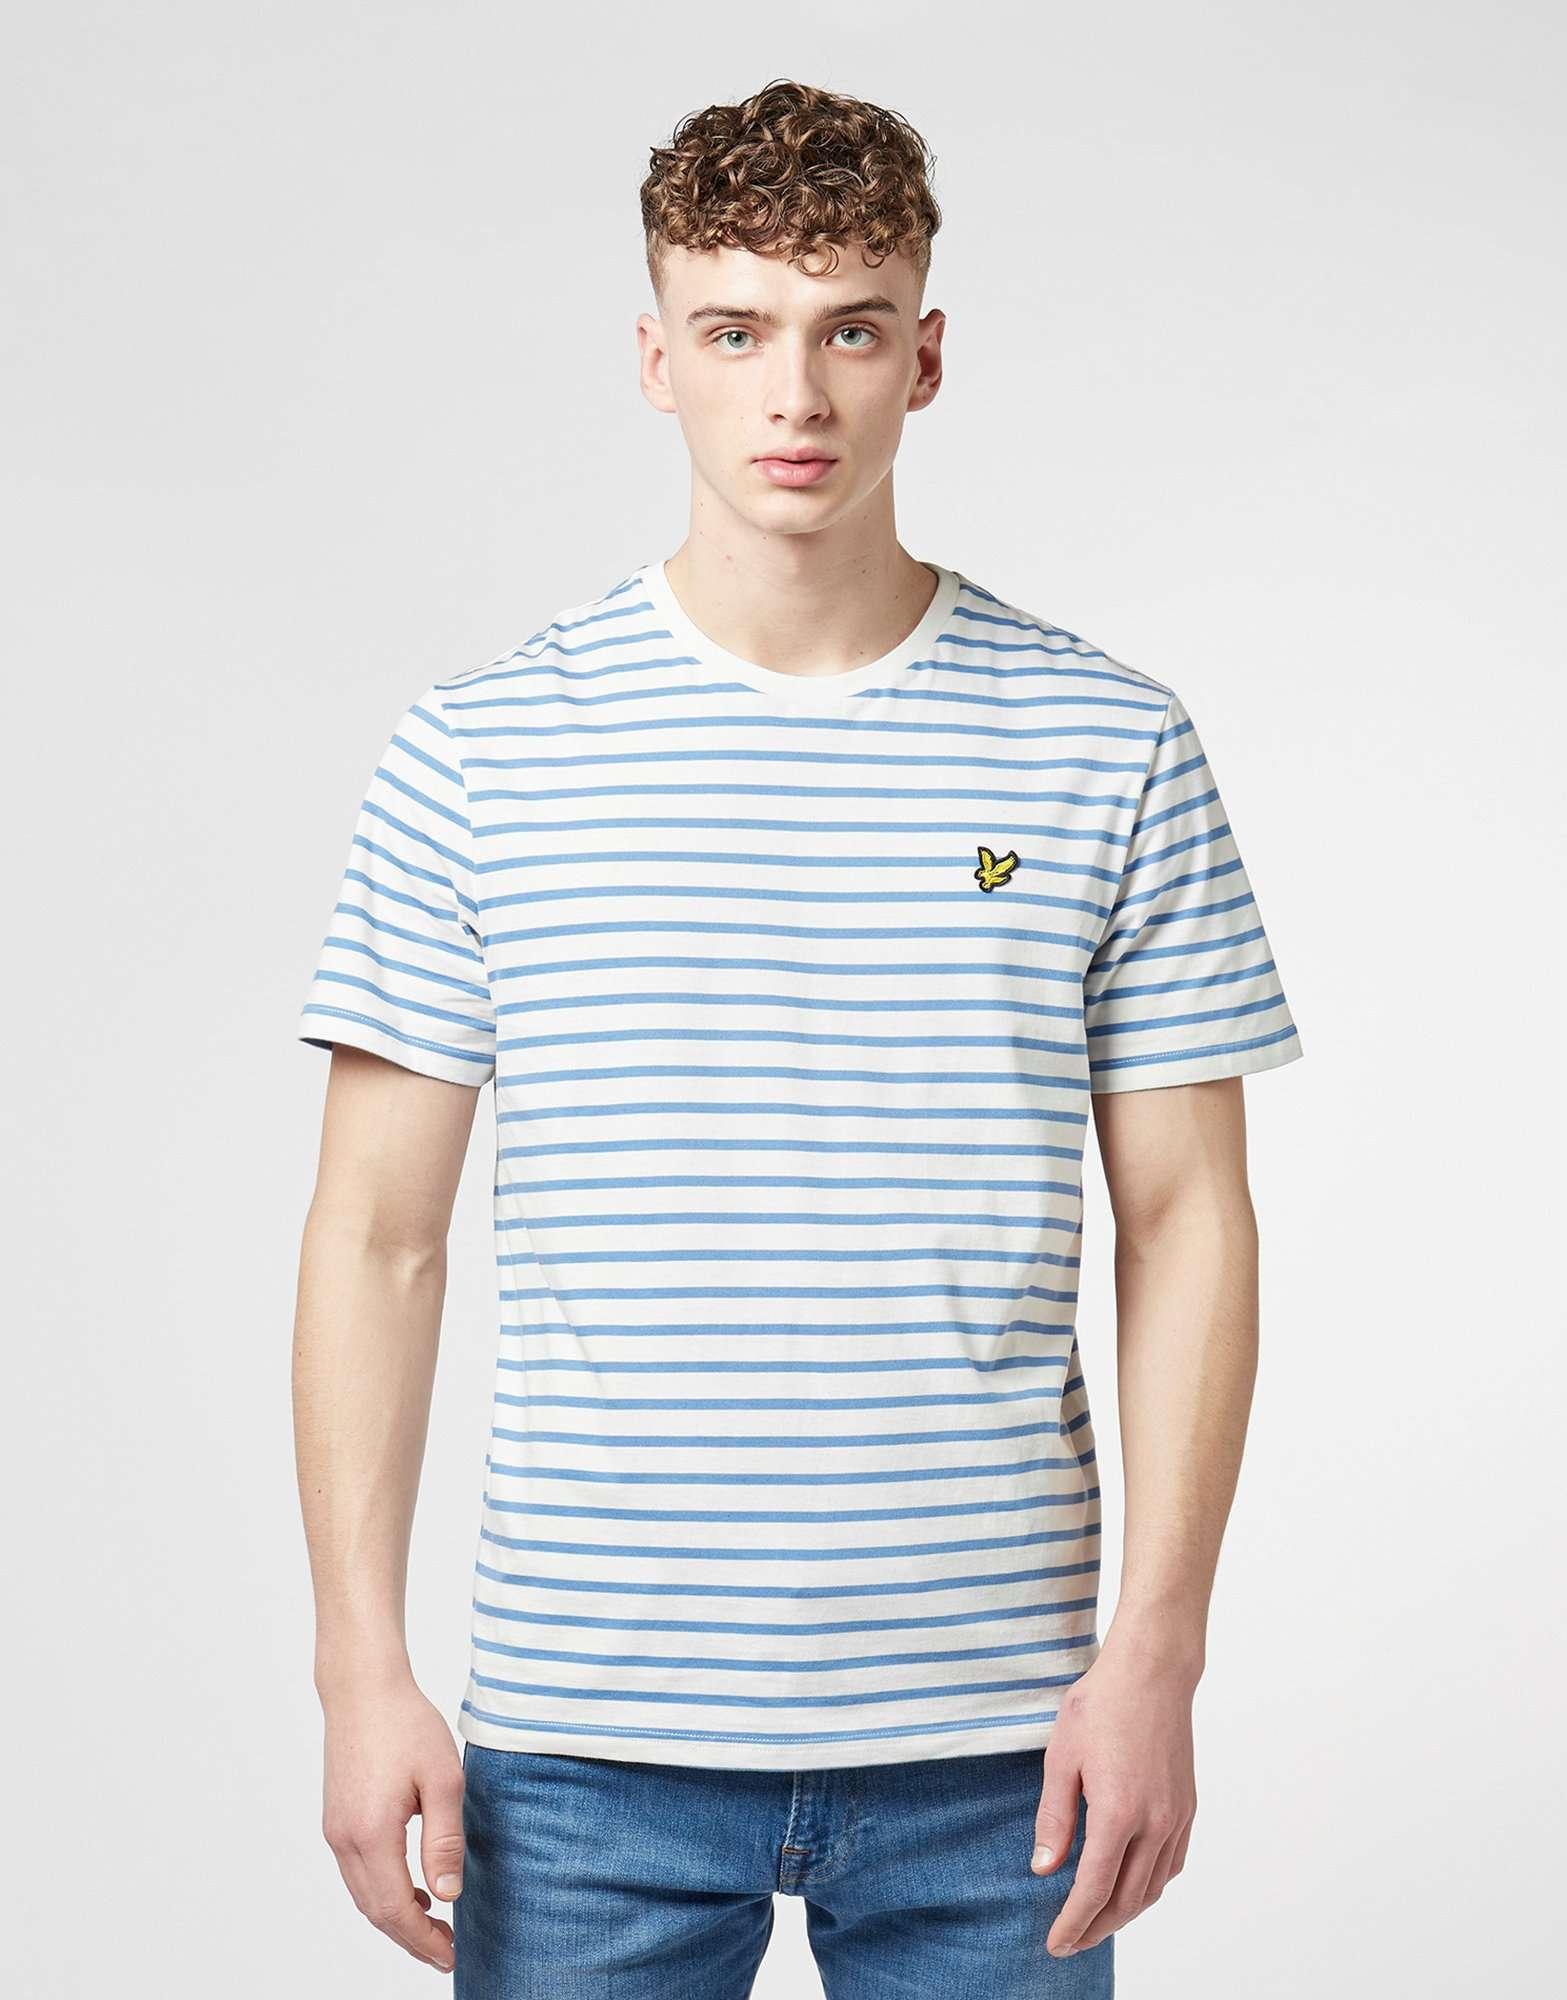 Lyle & Scott Breton Stripe Short Sleeve T-Shirt